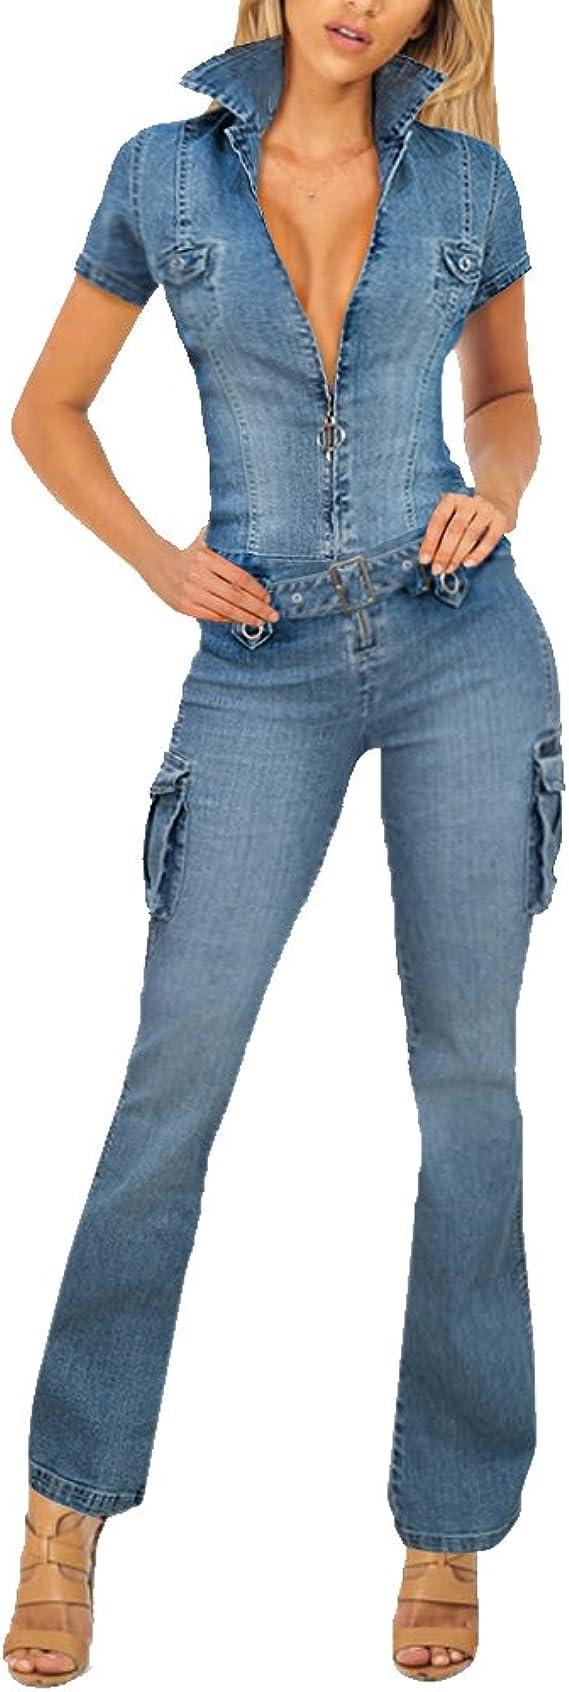 Hybrid & Company Womens Super Comfy Stretch Ripped Denim Jumpsuit | Trendy Styles Denim Romper